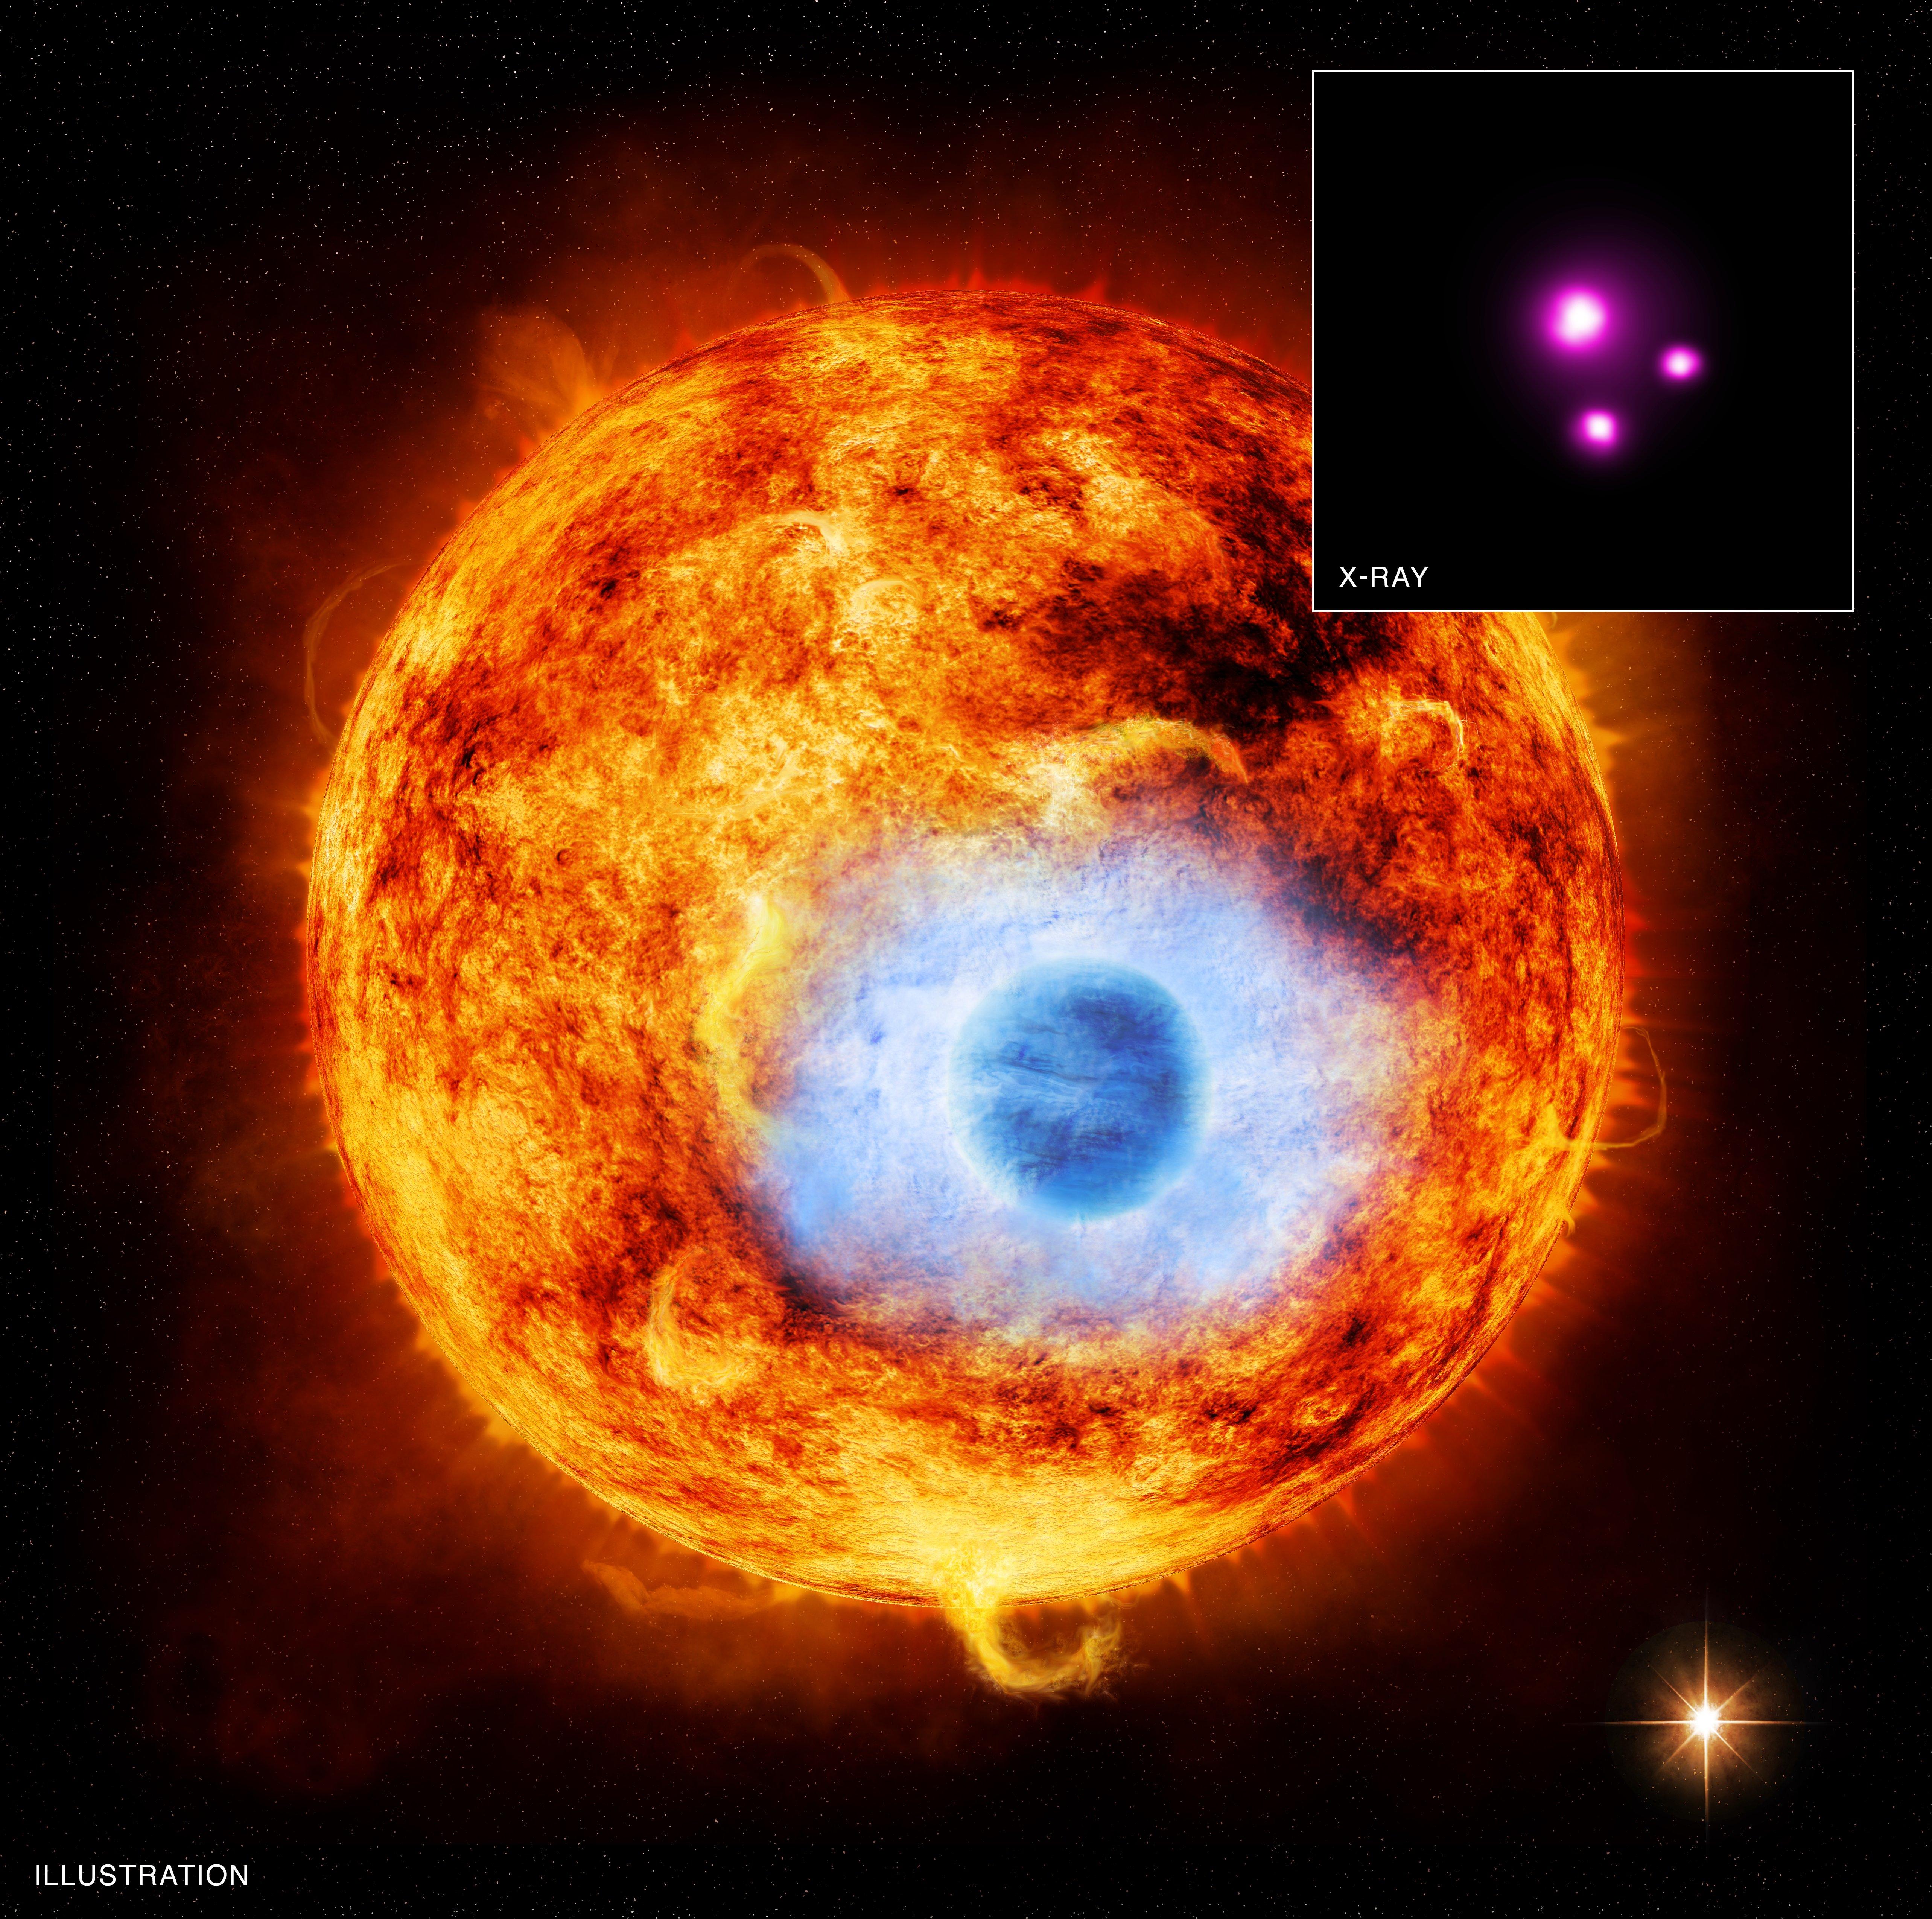 Exoplanet HD 189733b | NASA